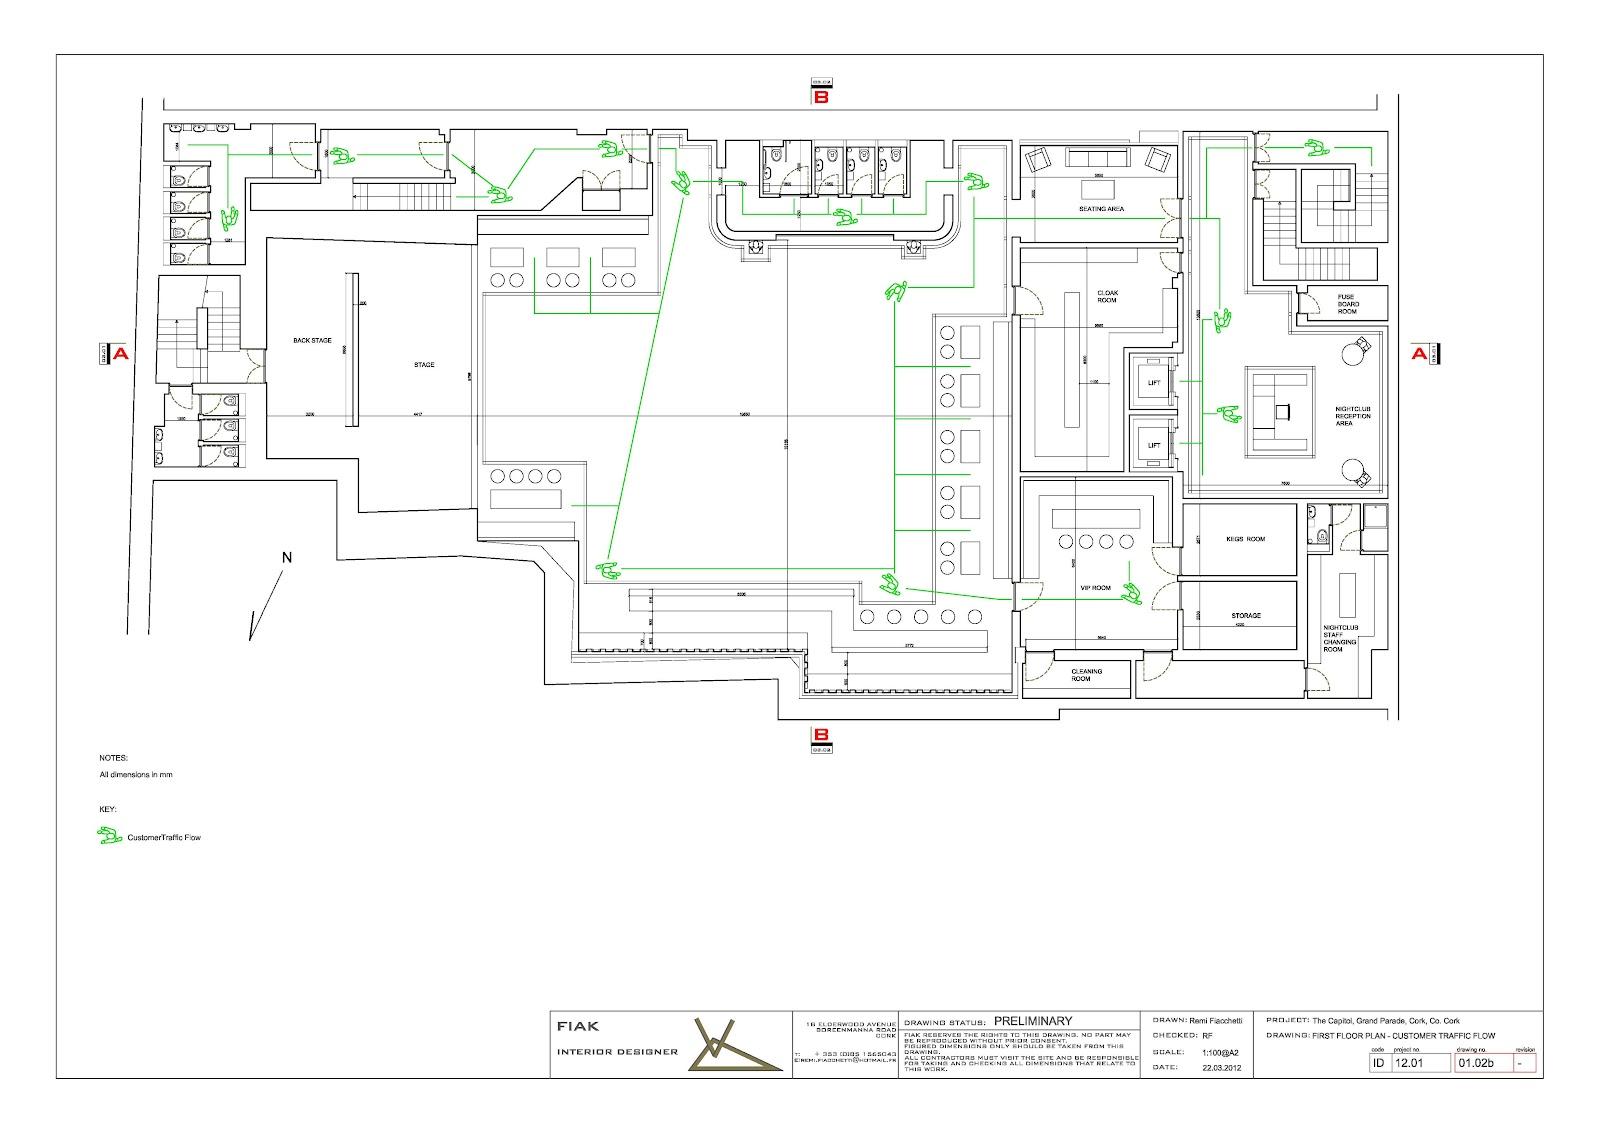 Fiak Interior Architecture Design